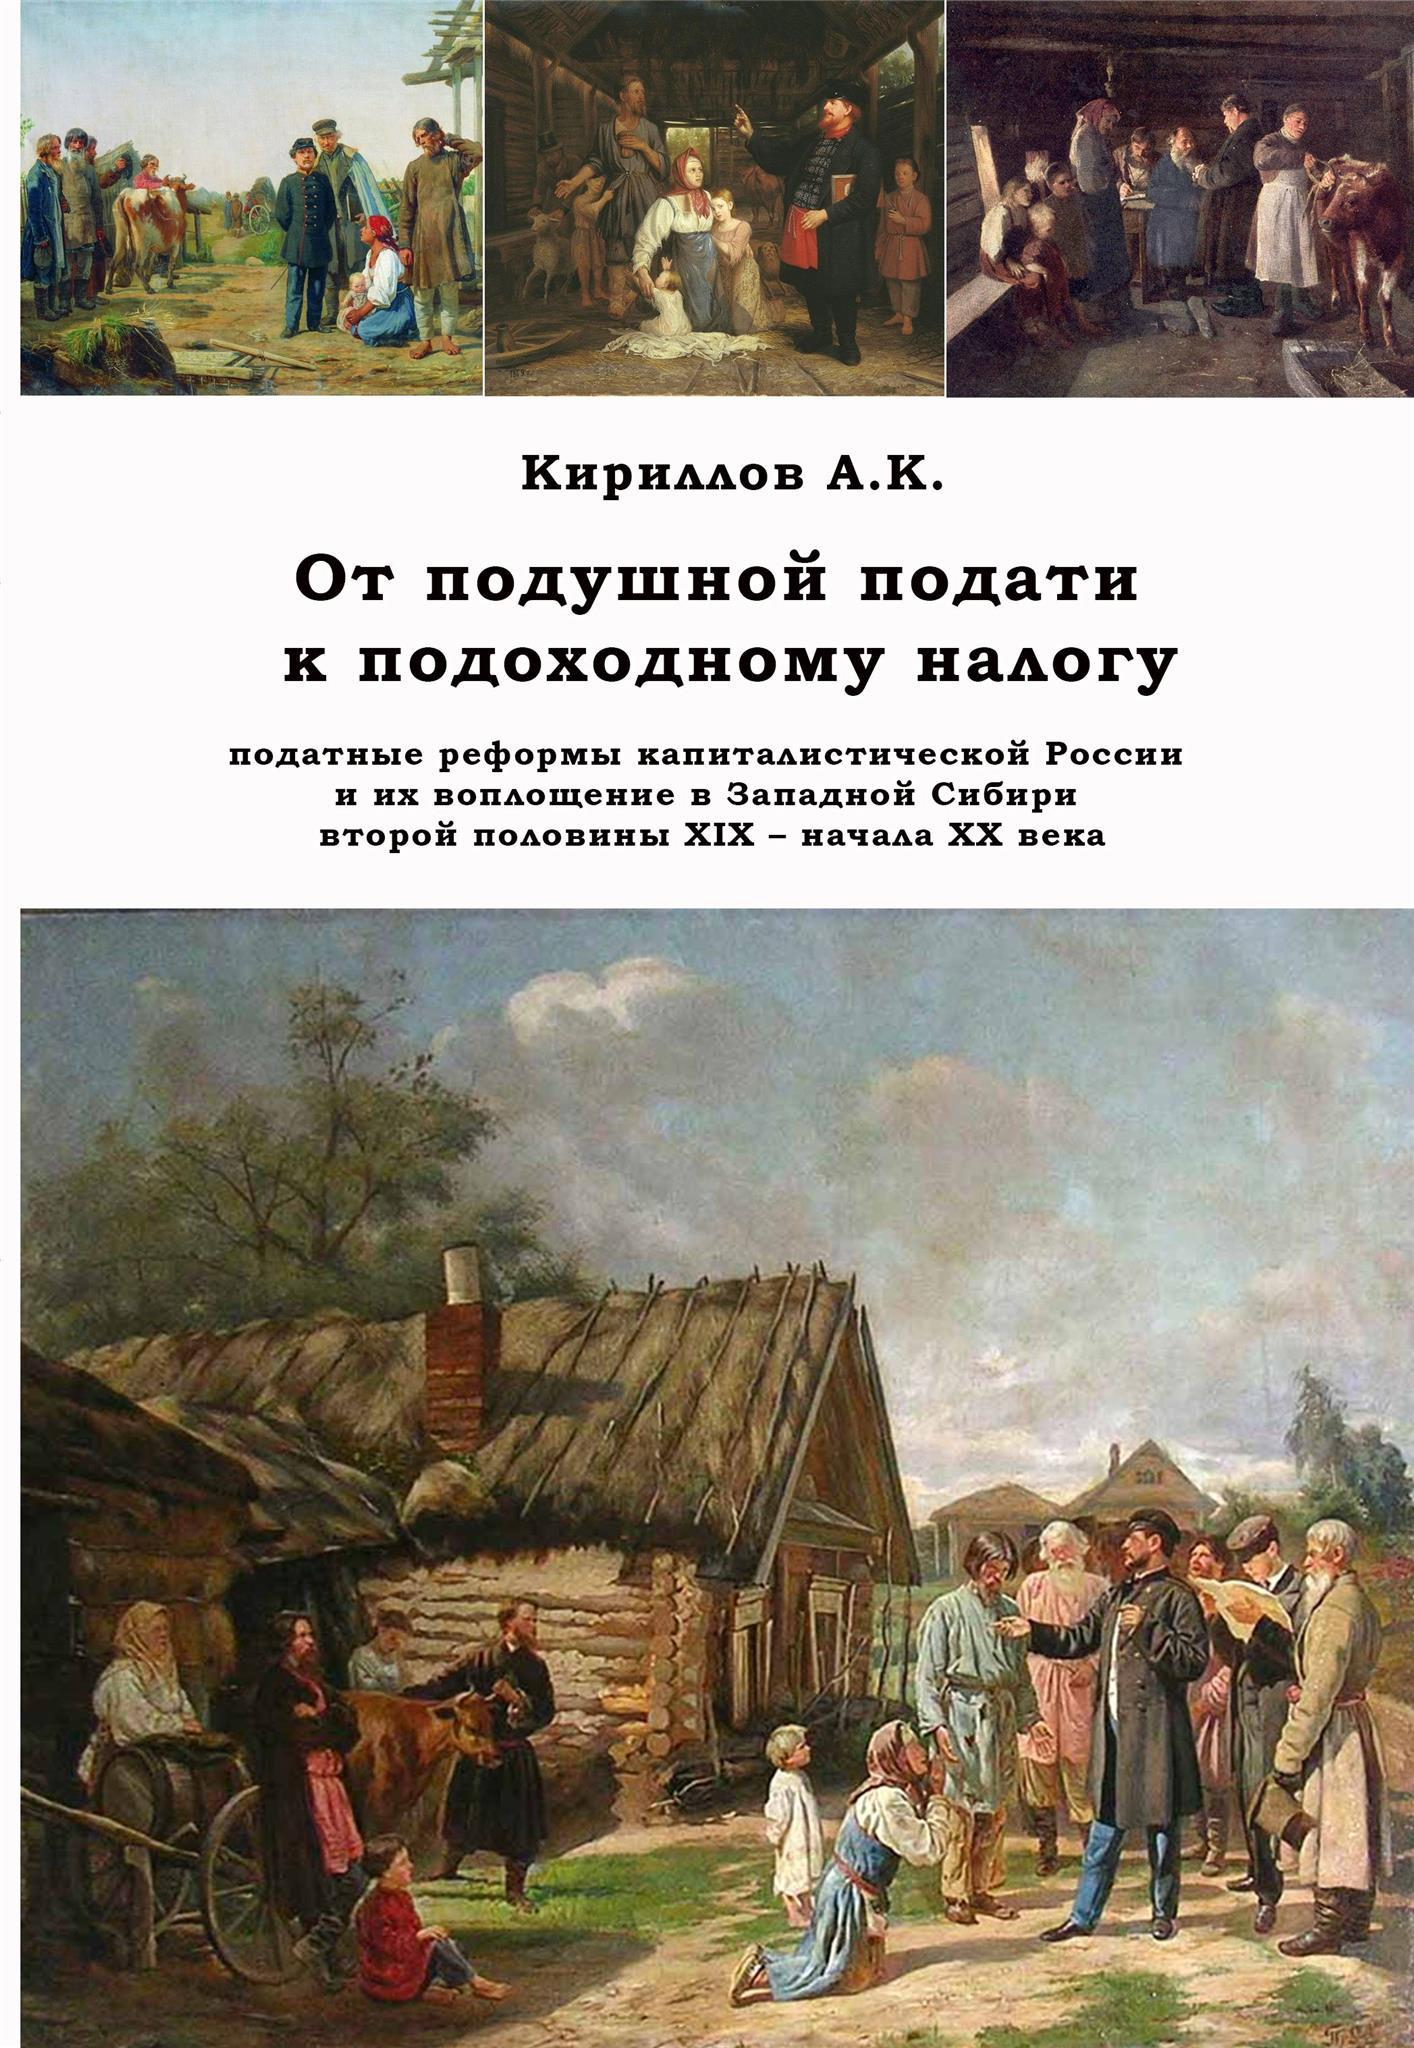 А. К. Кириллов. От подушной подати к подоходному налогу